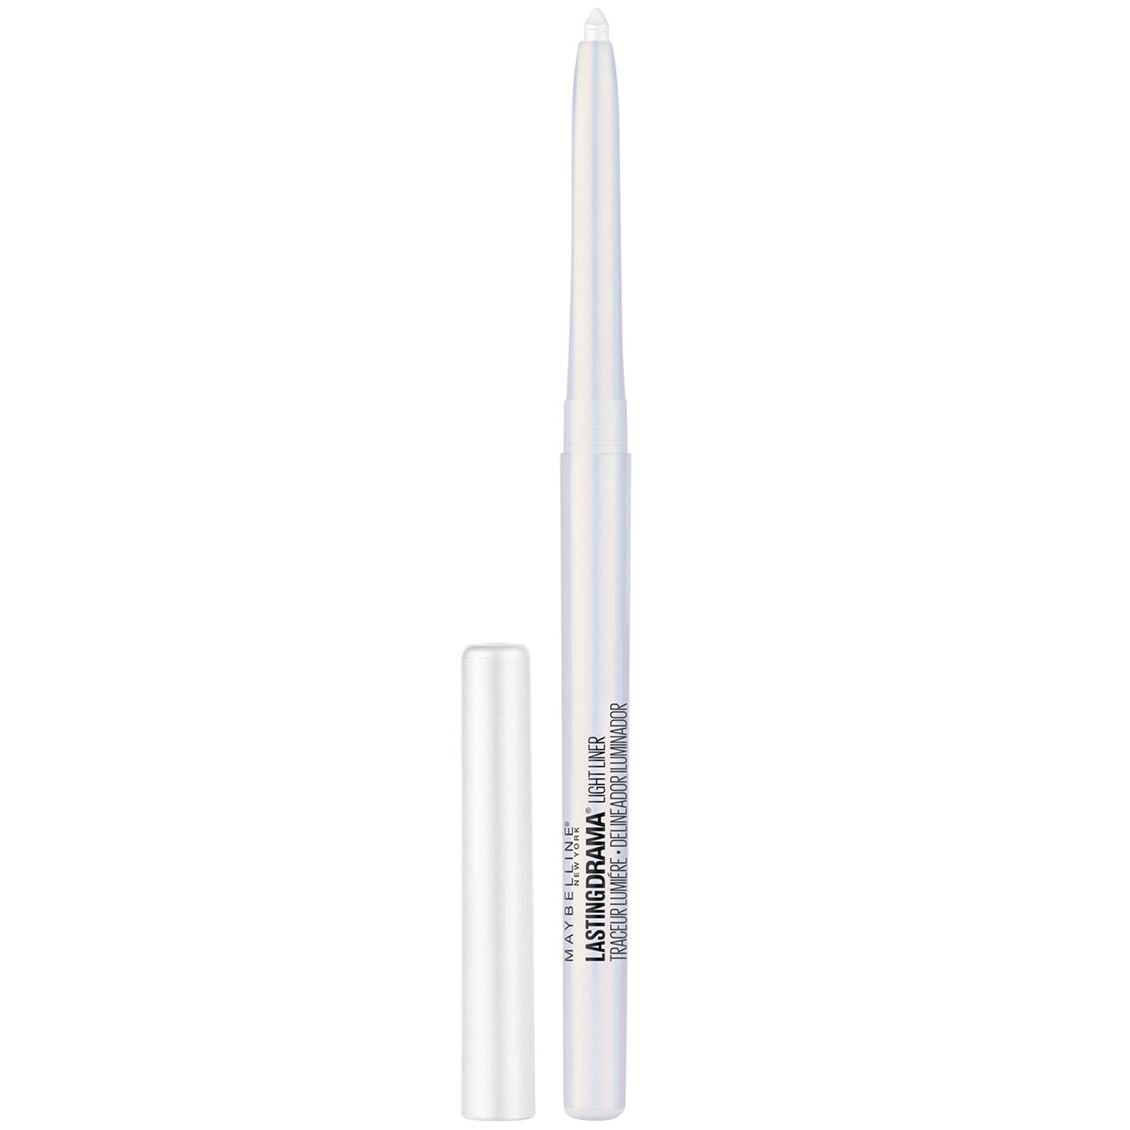 Lasting Drama Light Eyeliner Pencil